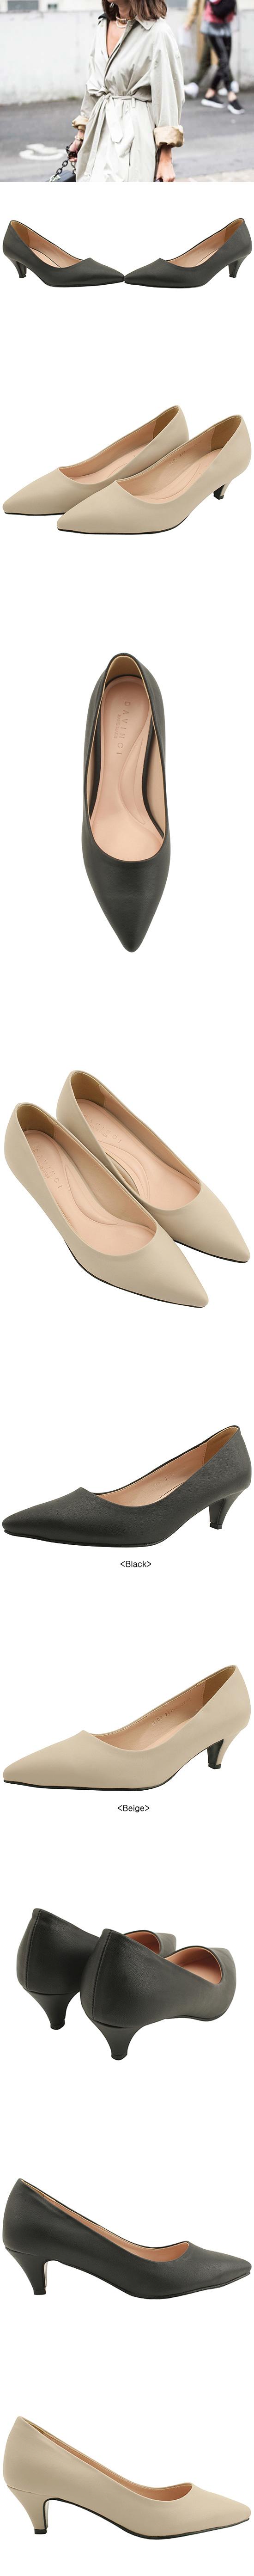 Simple Line Stiletto Middle Heel 5cm Beige